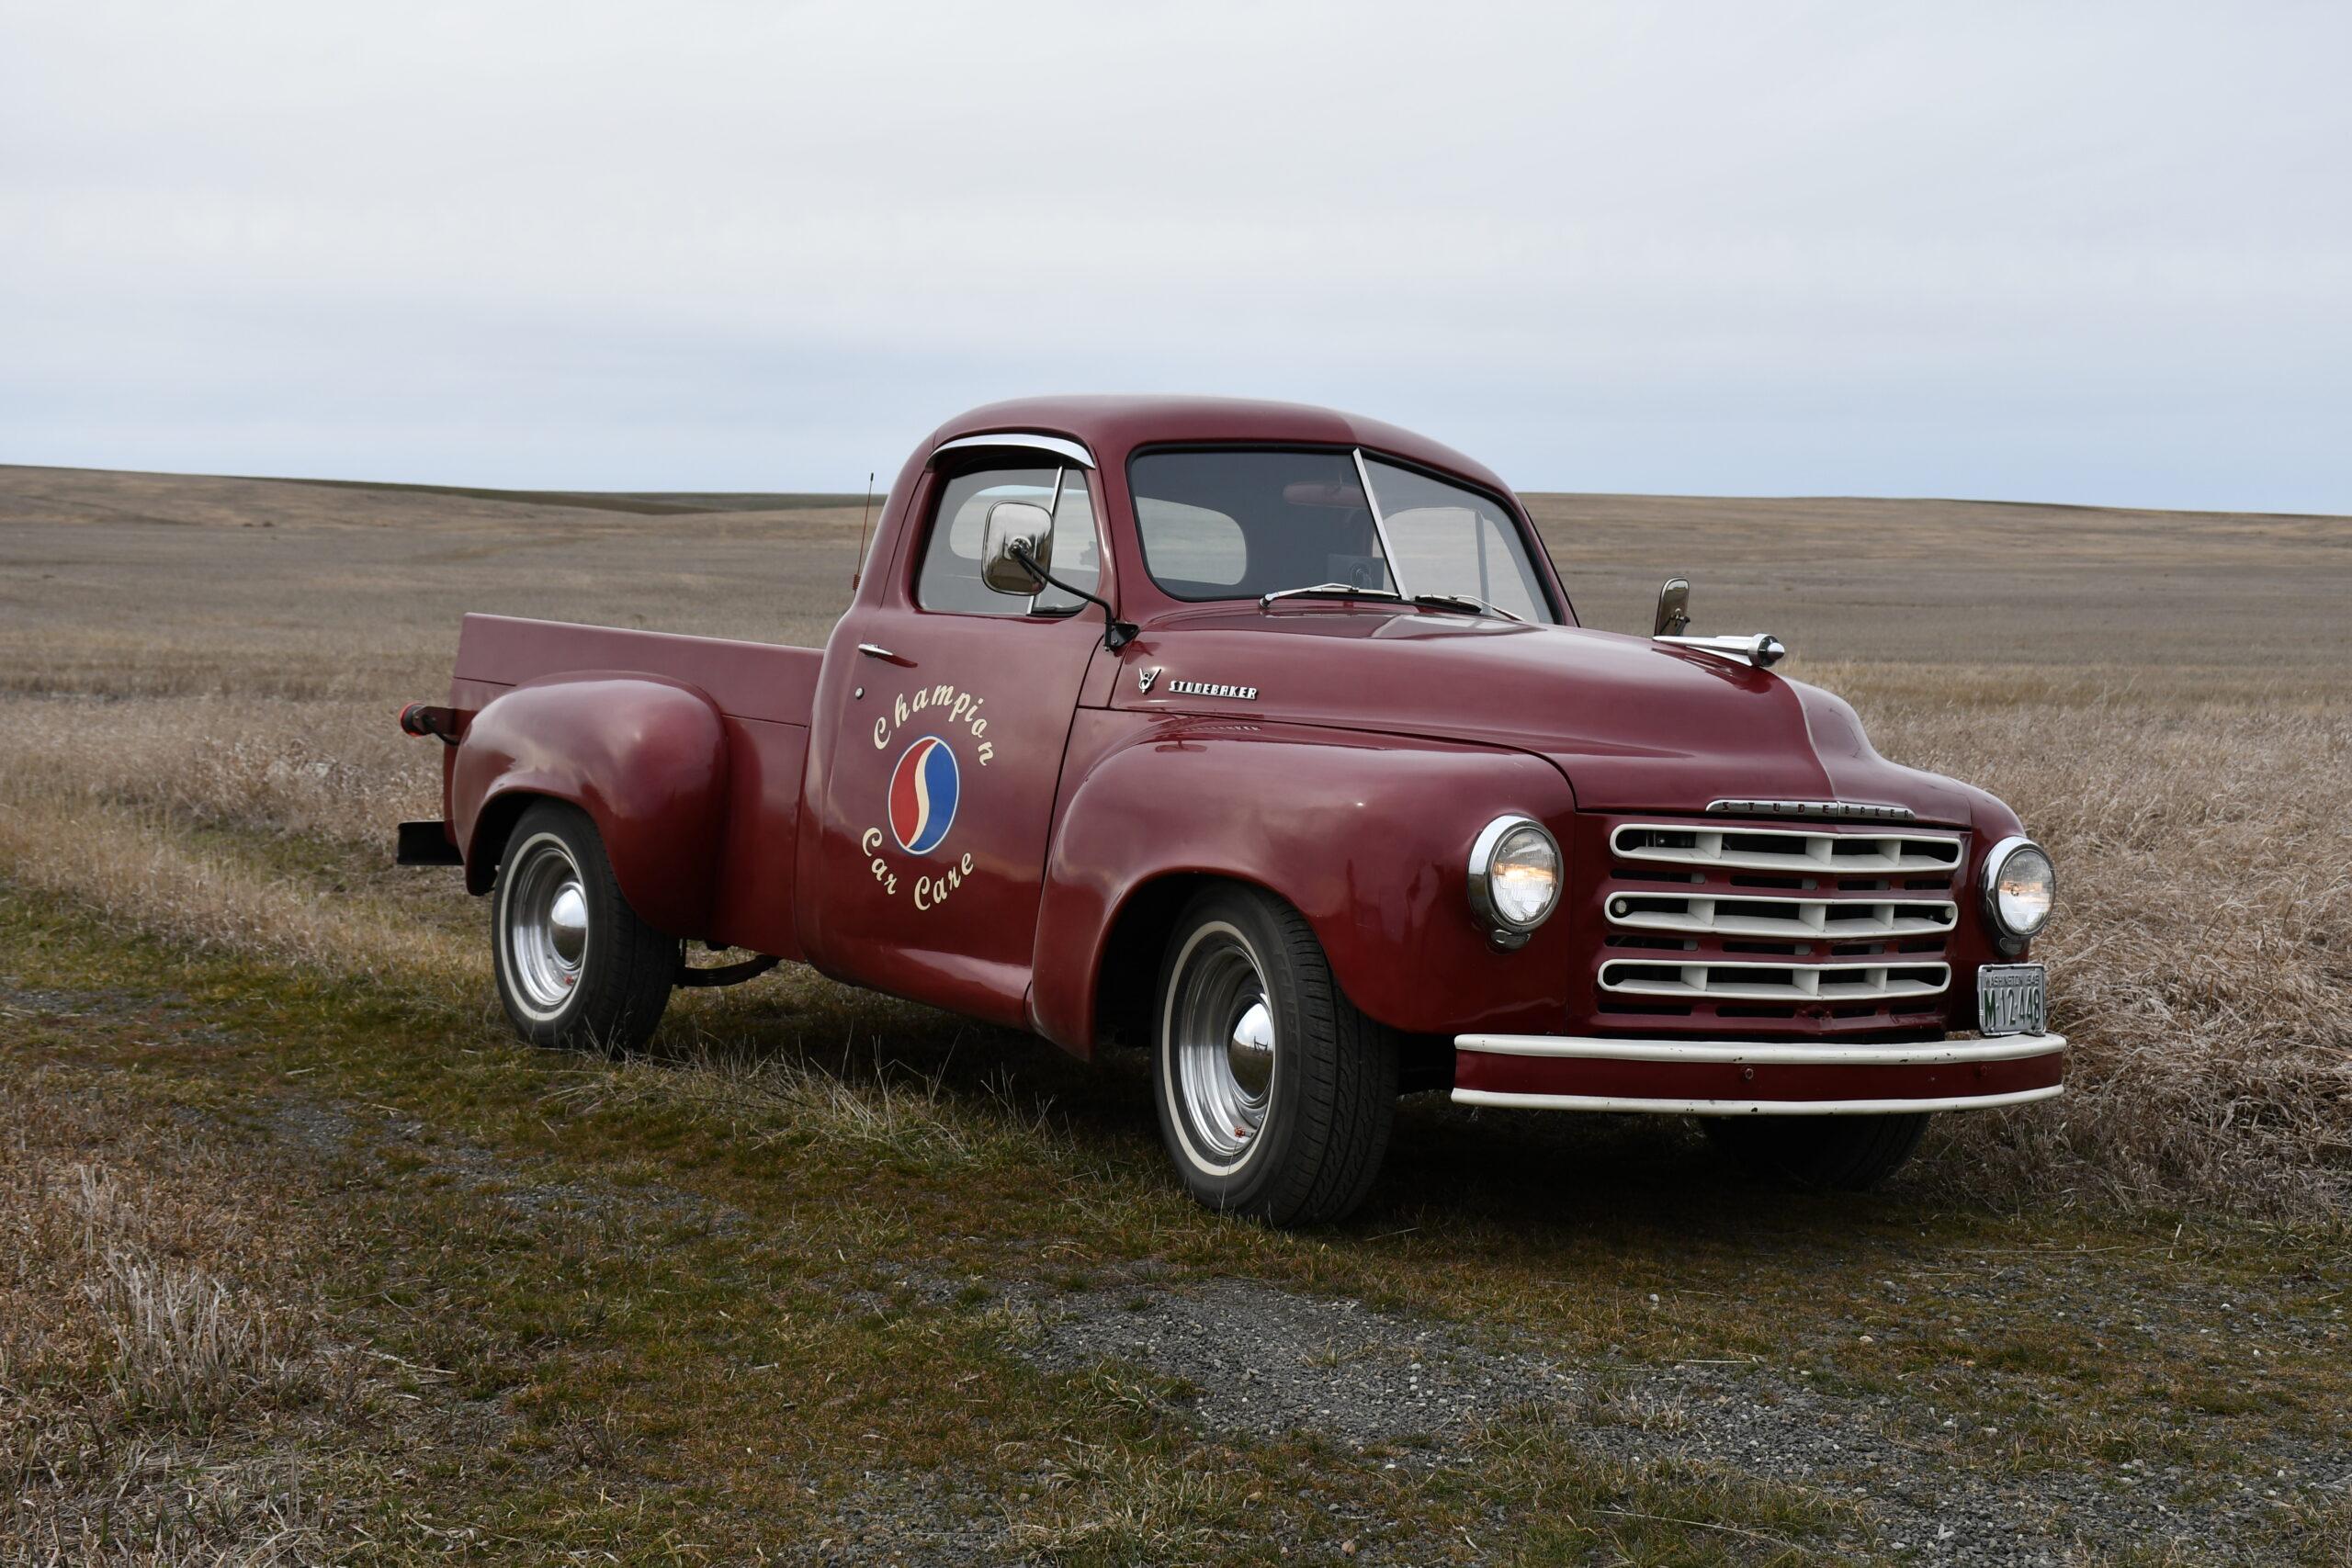 Brian Curtis - Davenport, WA - 1949 Studebaker Pickup